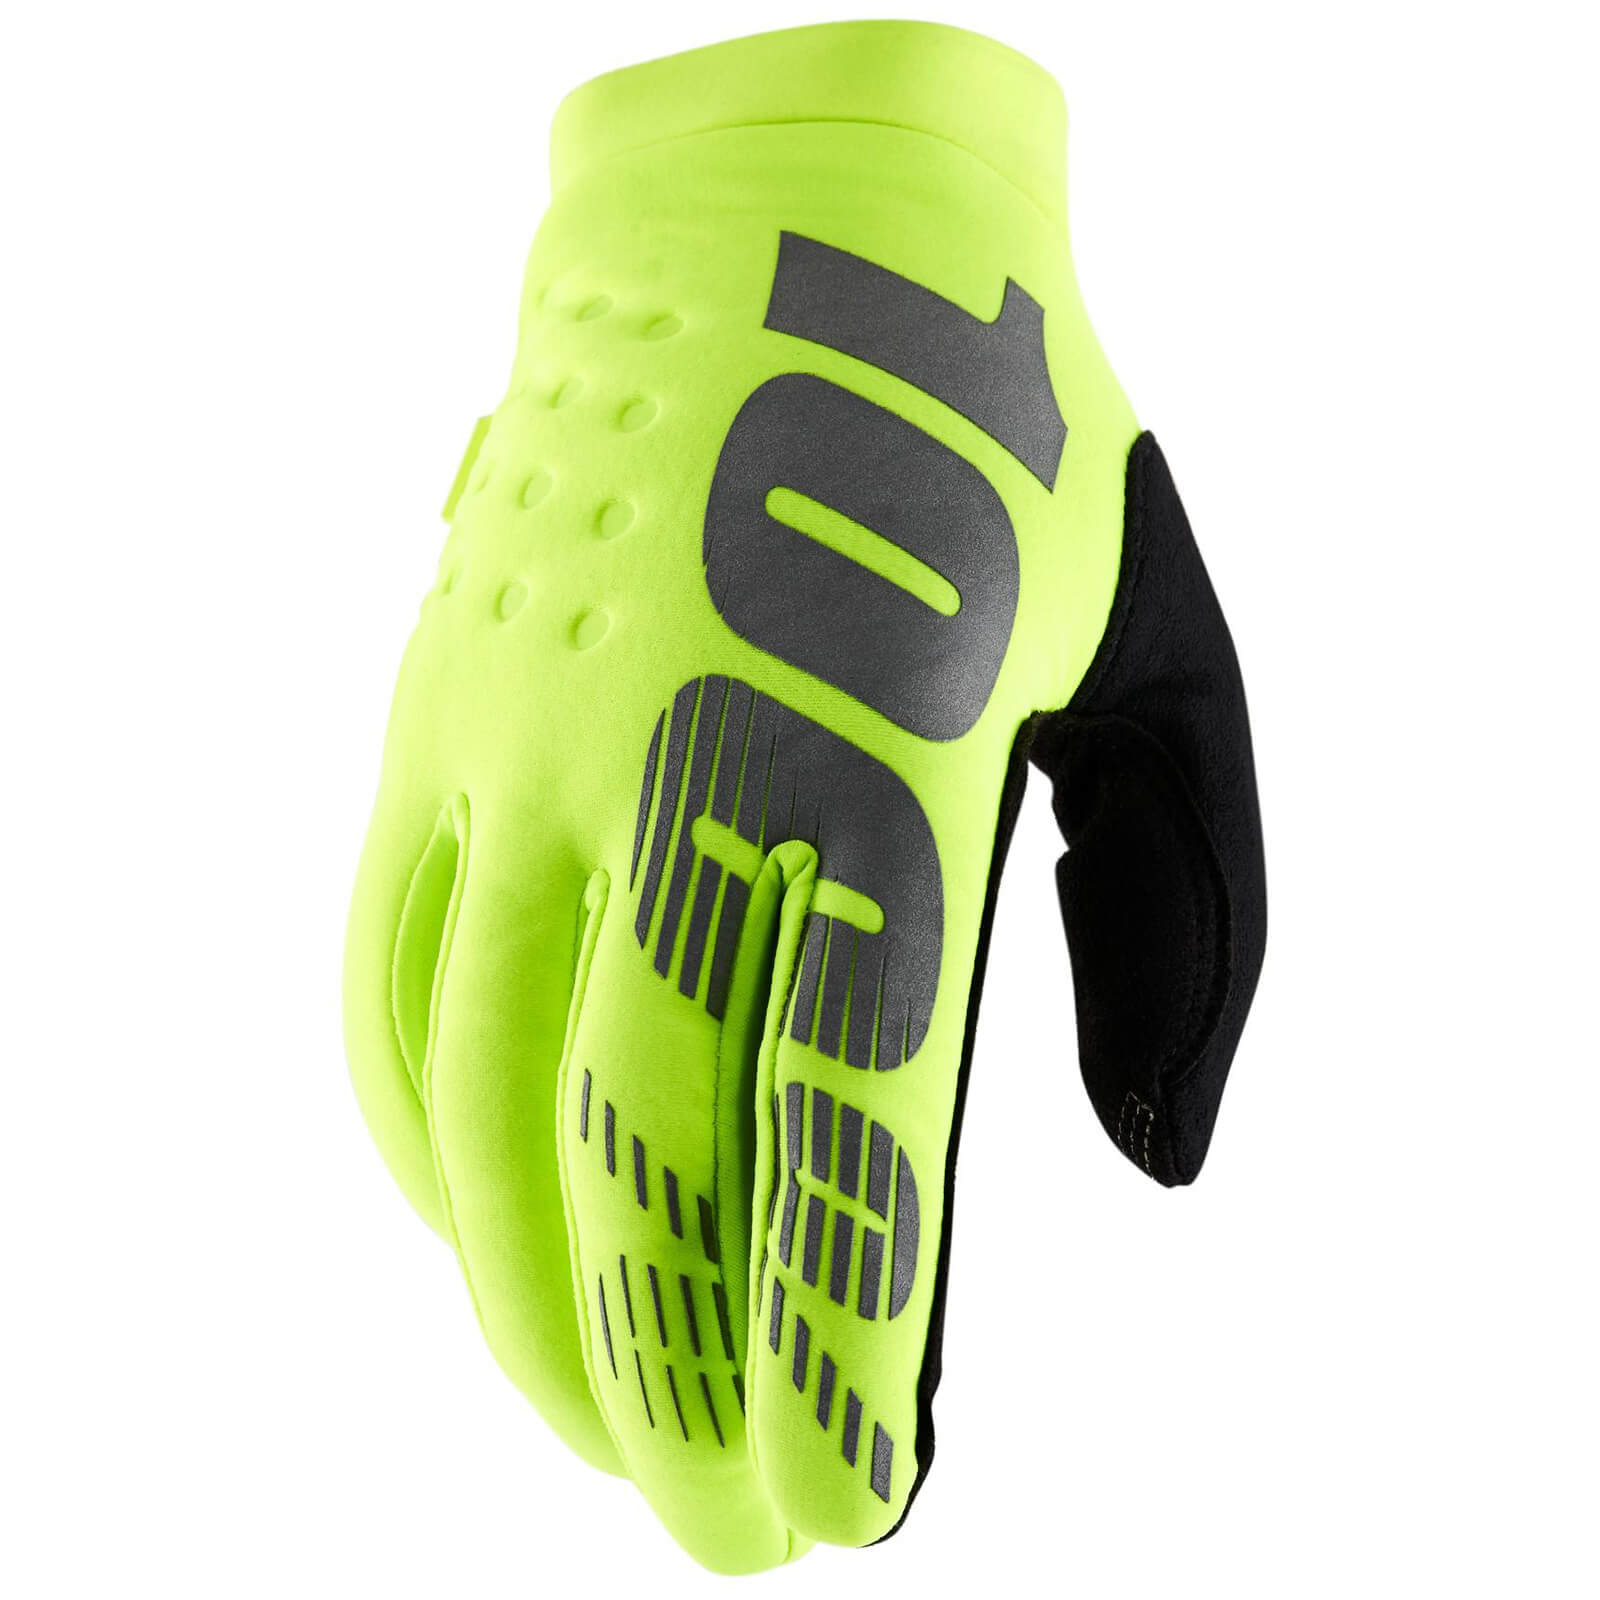 Image of 100% Brisker MTB Gloves - M - Yellow